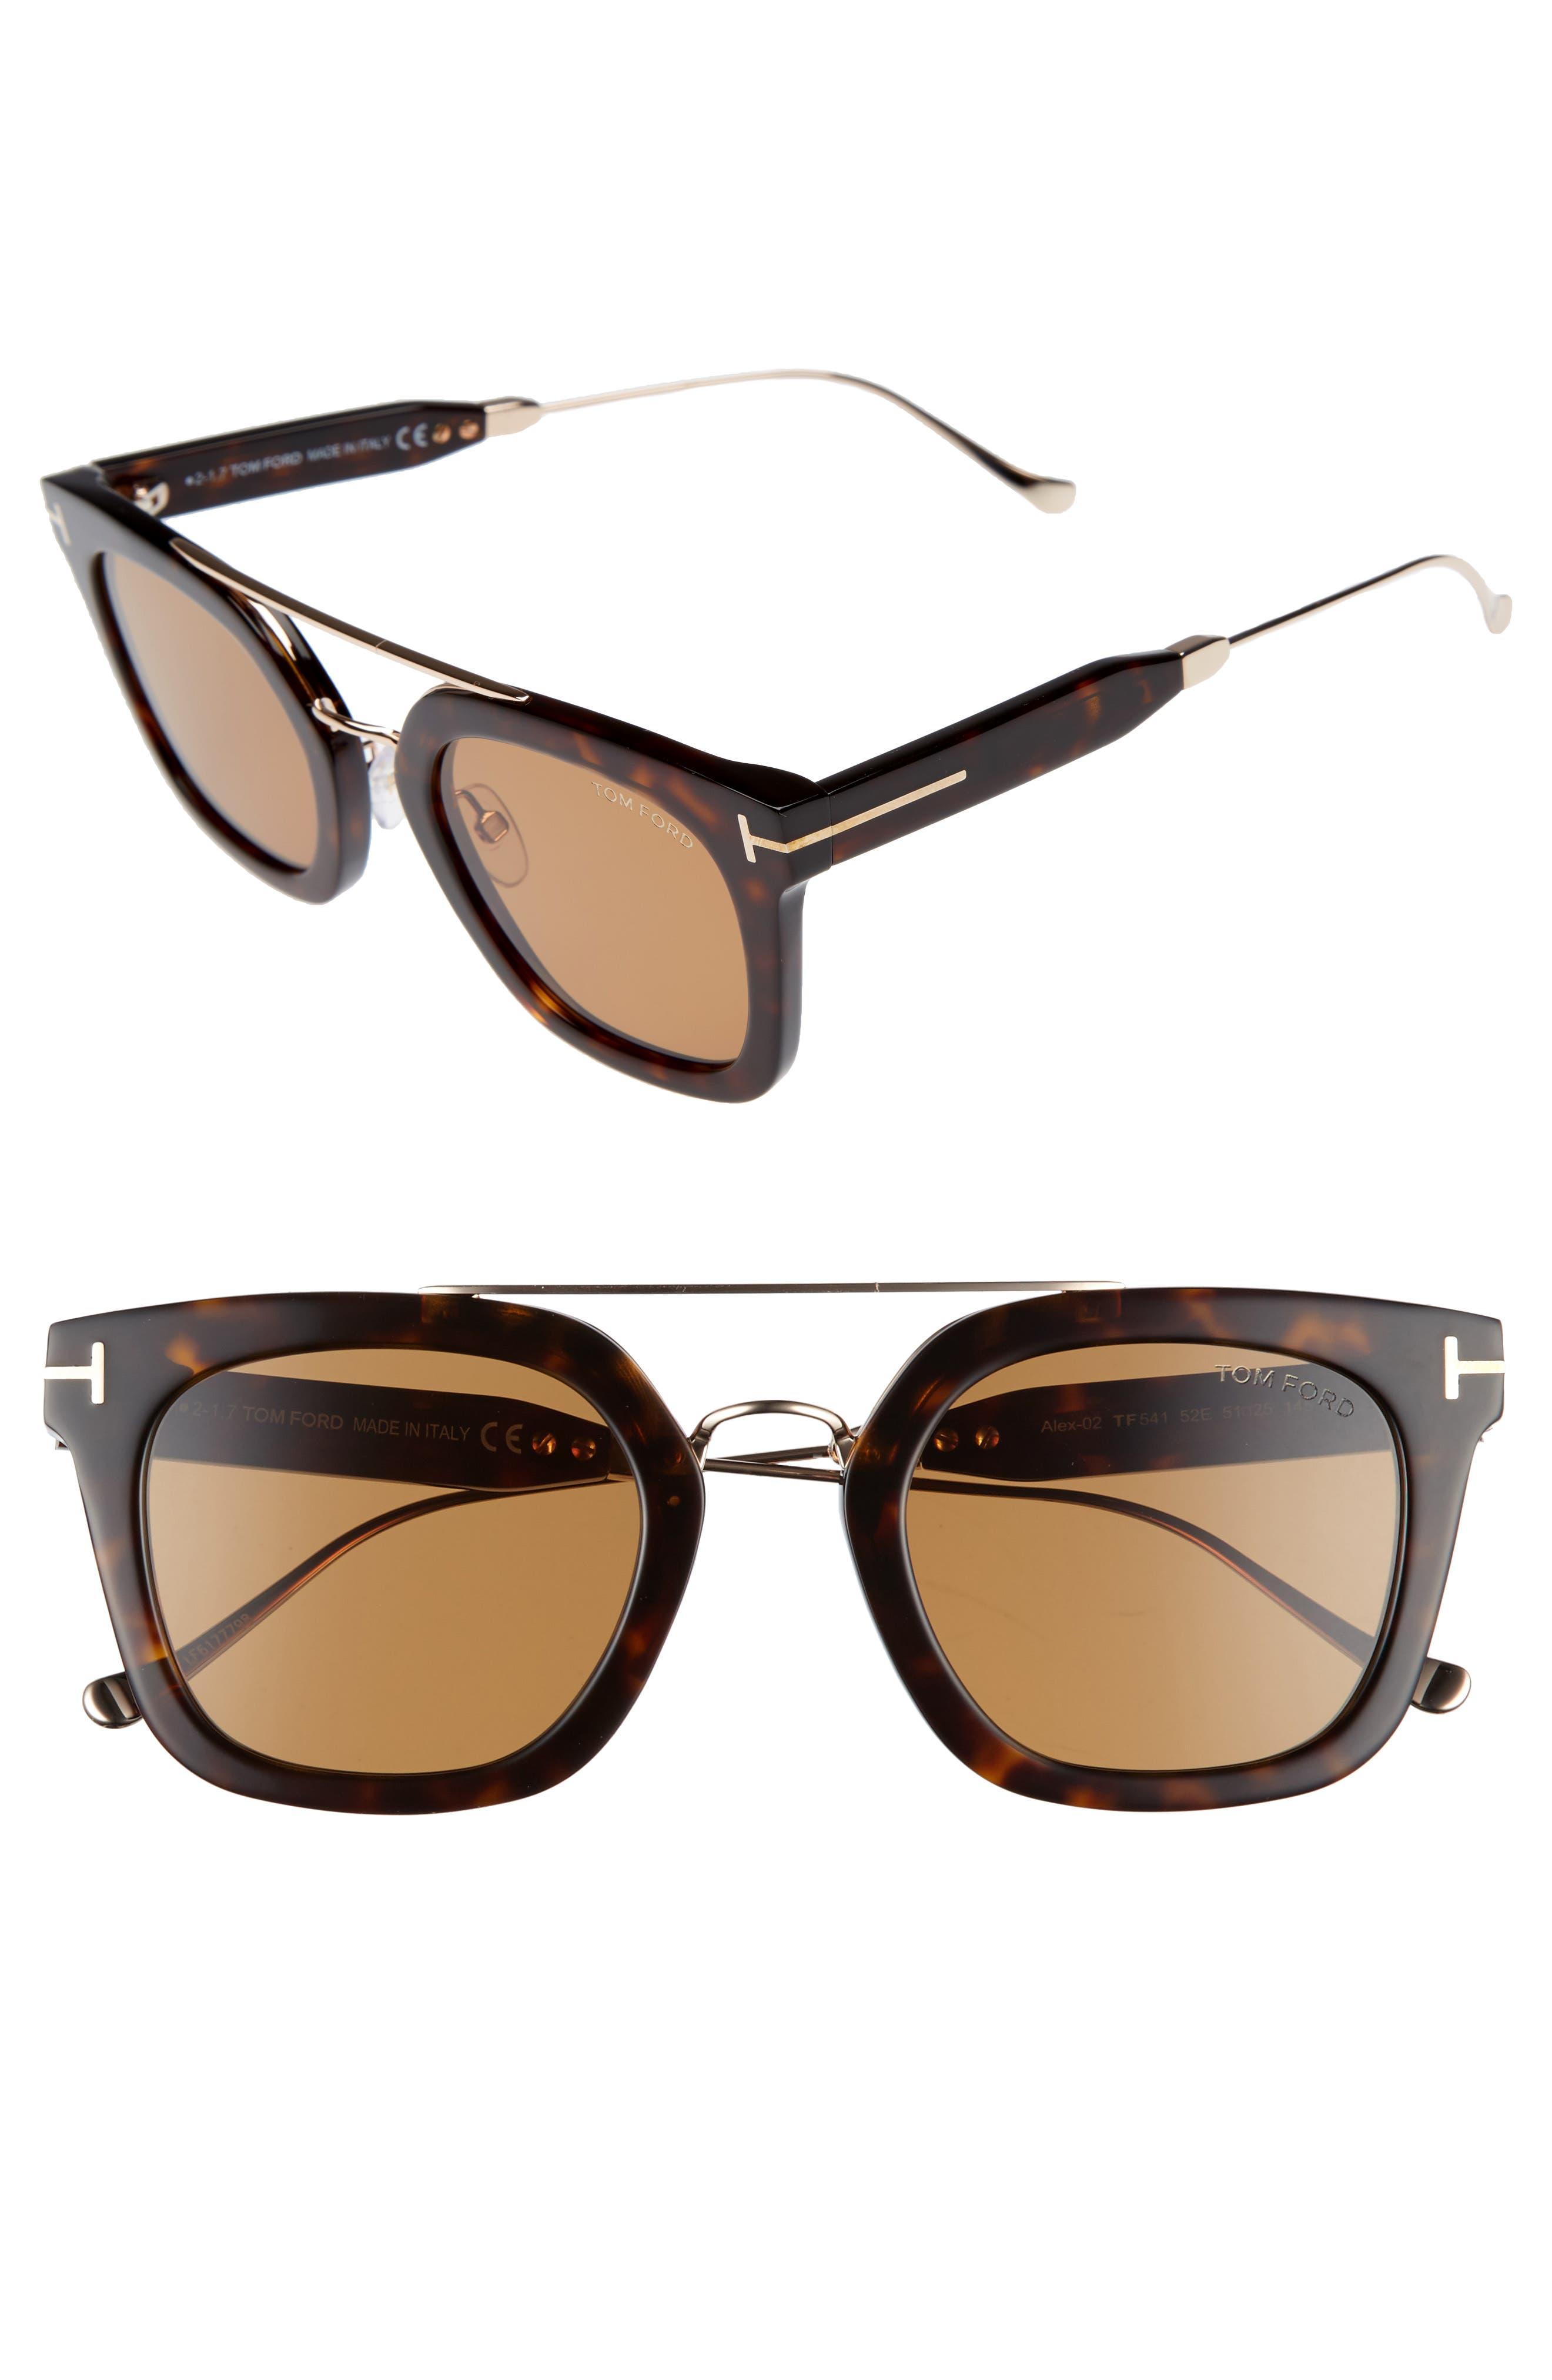 Alex 51mm Sunglasses,                             Main thumbnail 1, color,                             Dark Havana / Brown